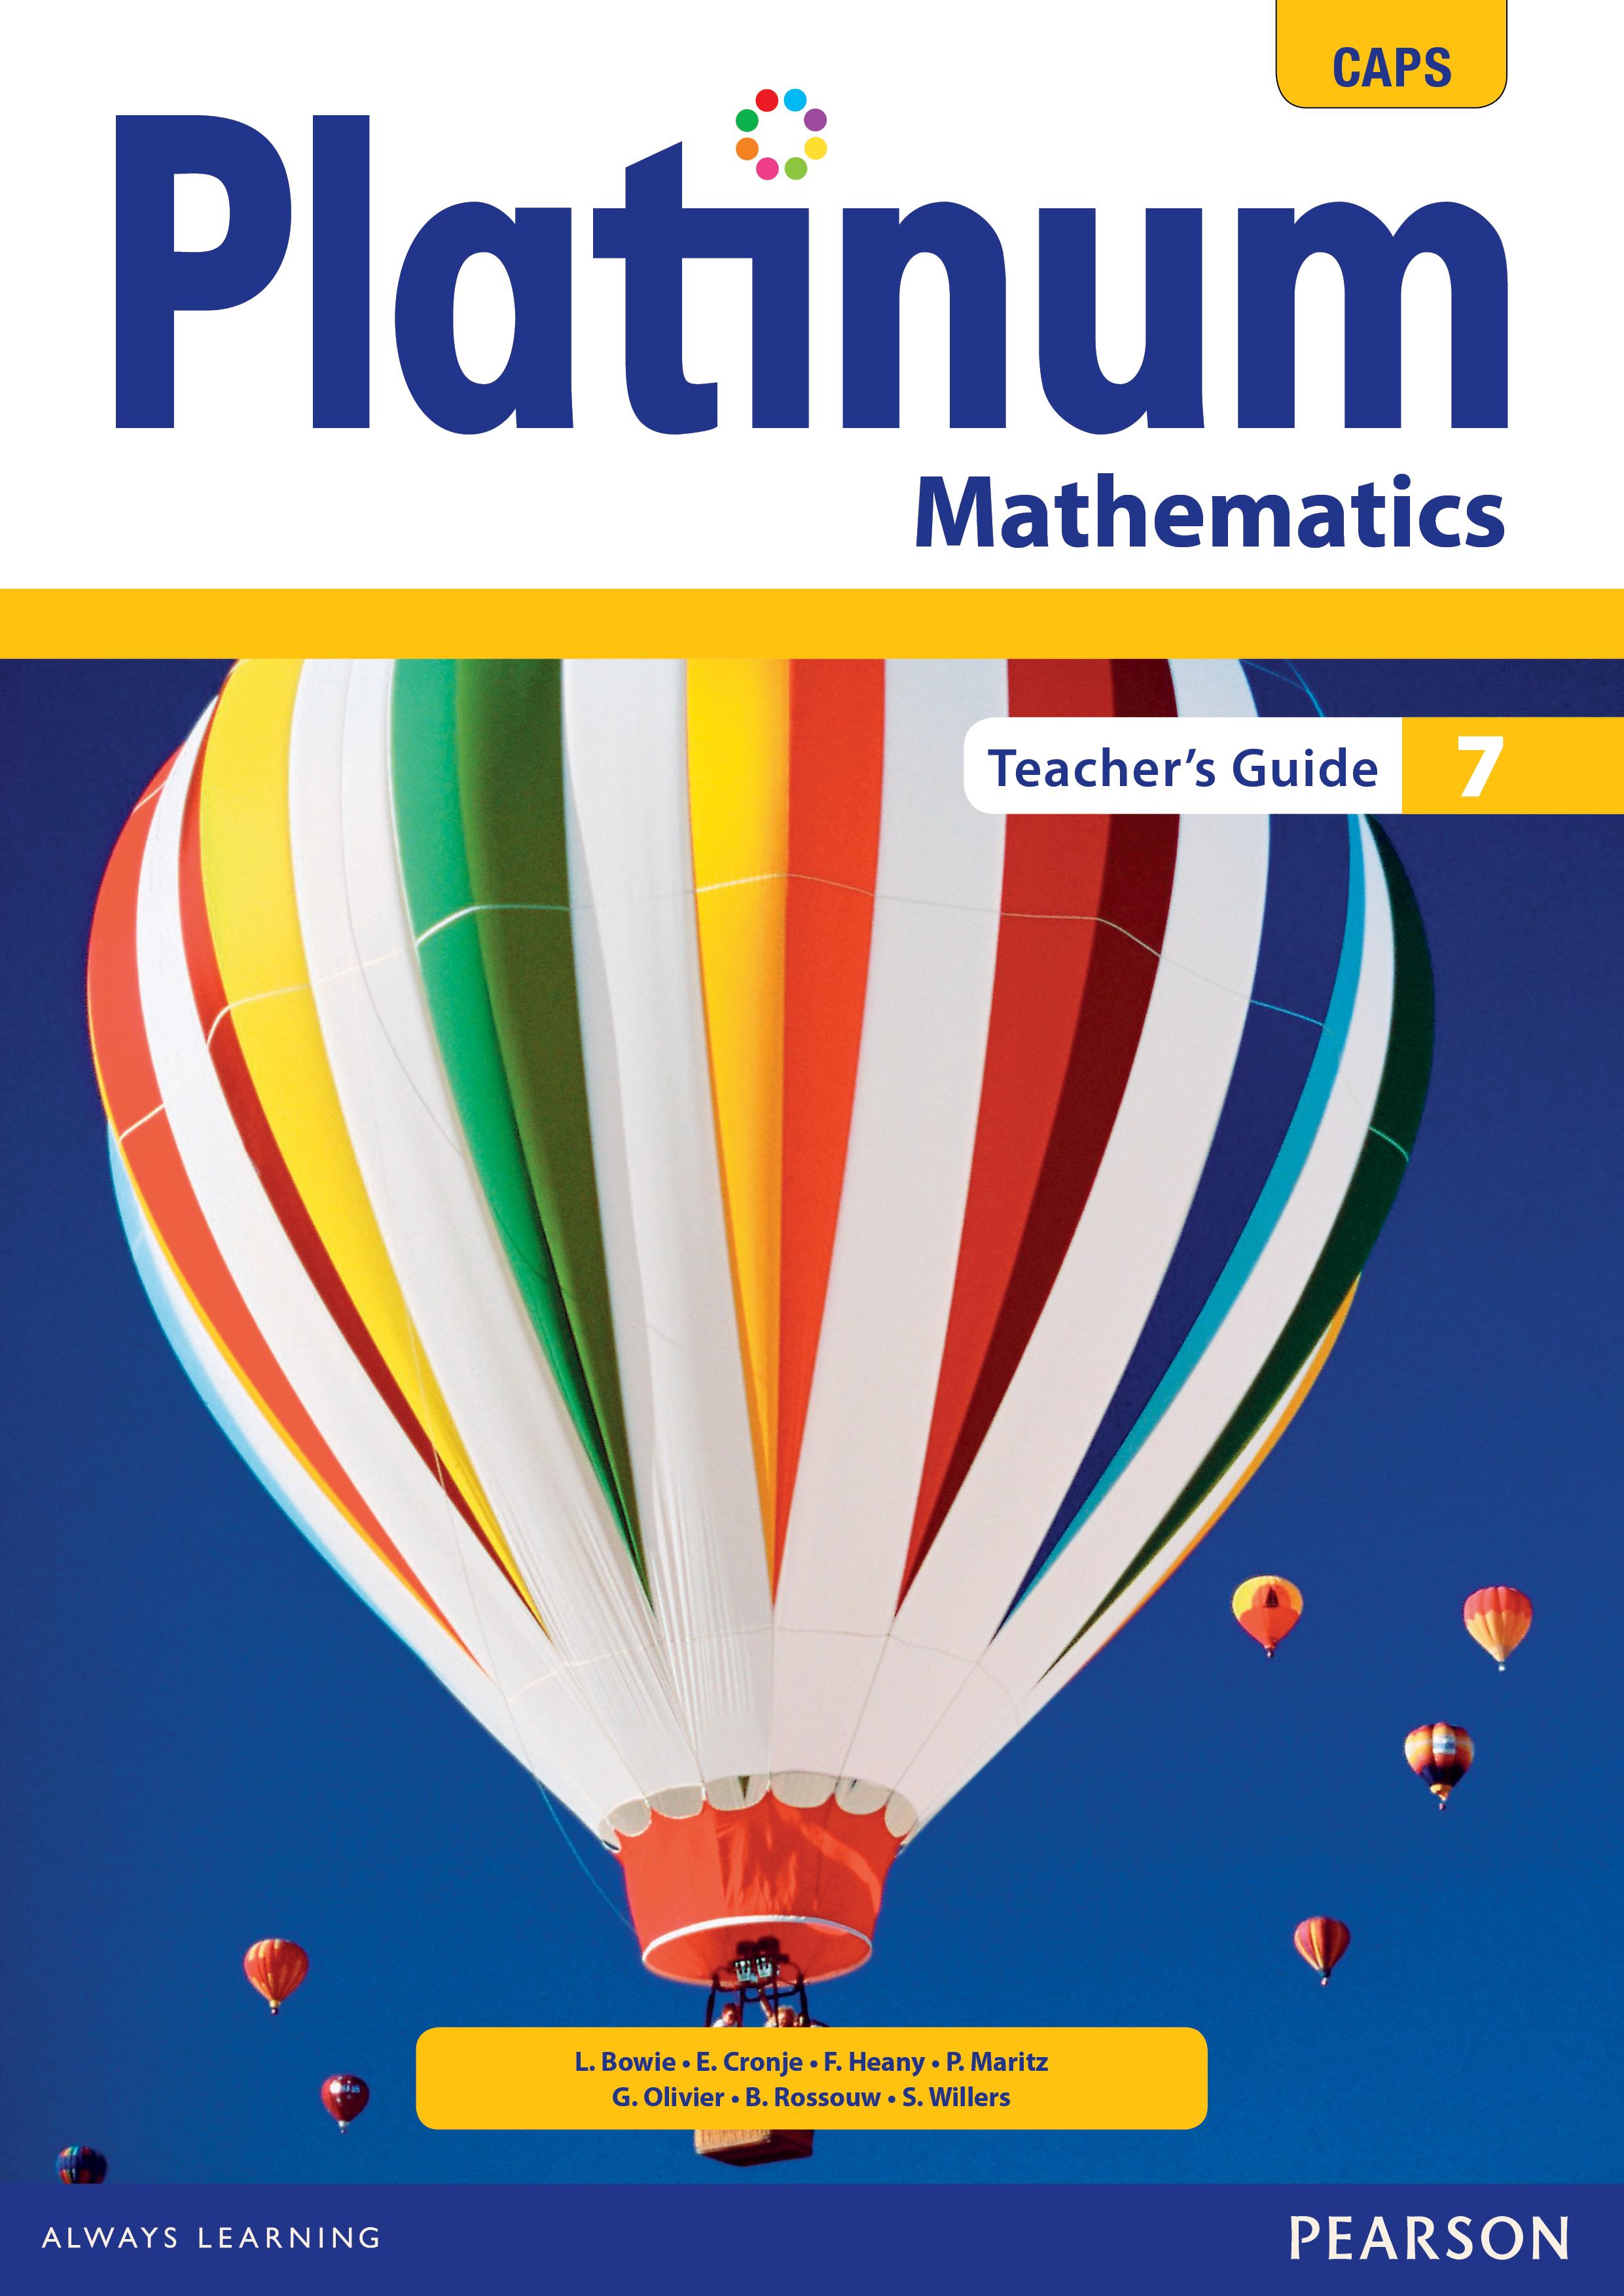 Platinum Mathematics Grade 7 Teacher's Guide ePDF (1-year licence)